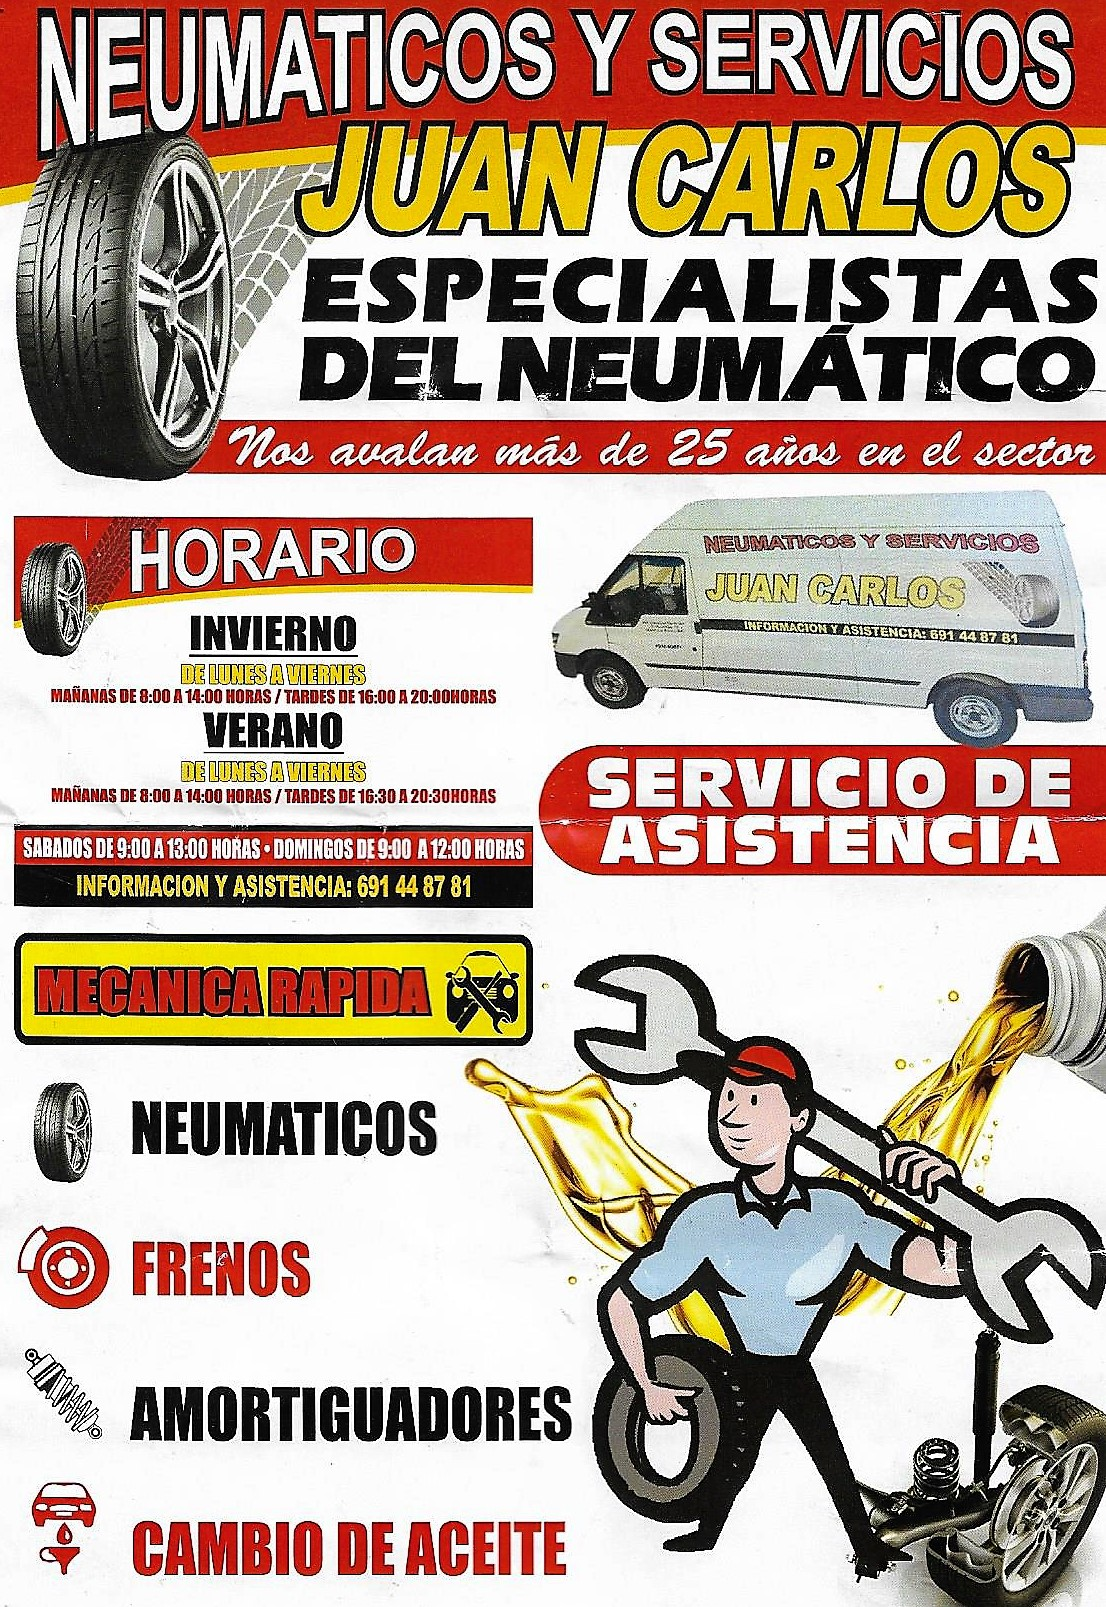 neumaticos ruedas Don Benito Jose Luis